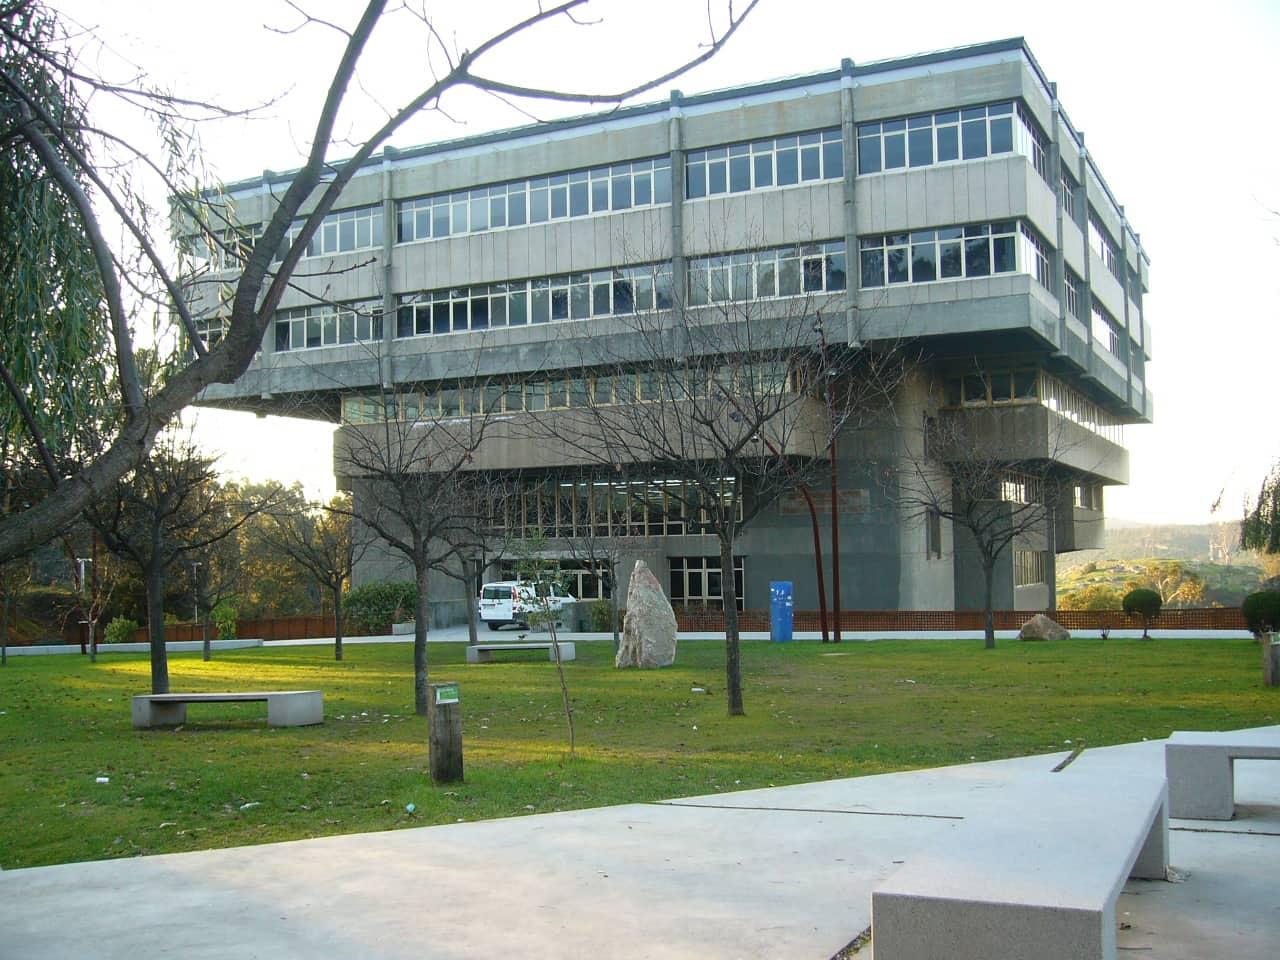 Escuela Tecnica Superior de Arquitectura UDC min